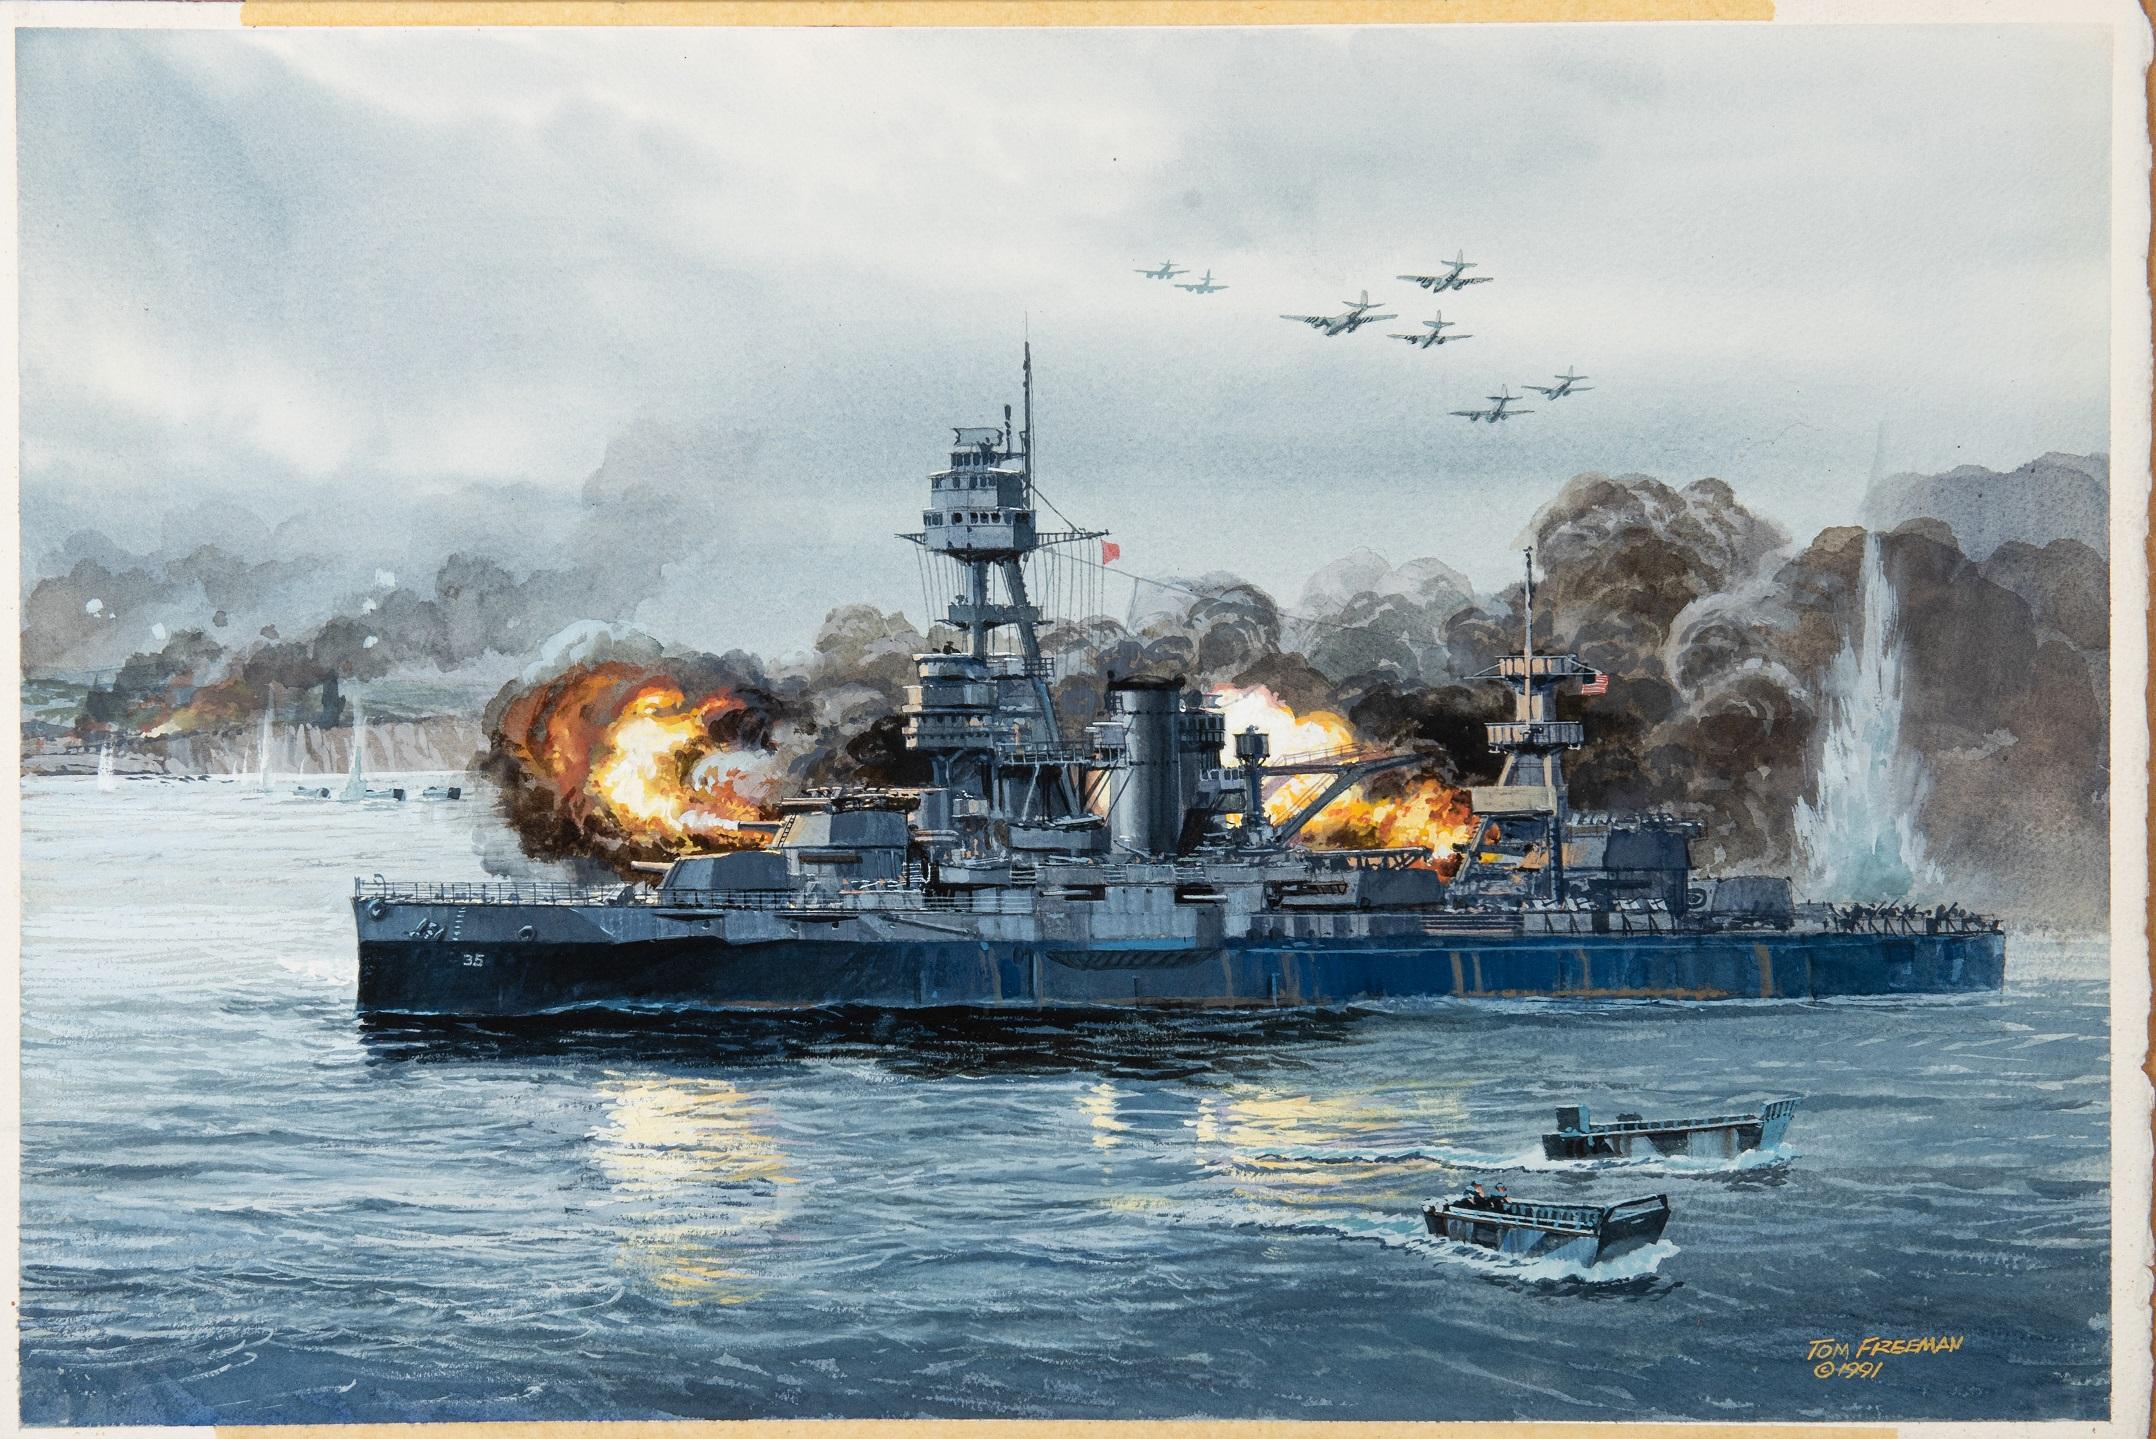 Battleship Texas at Normancy artwork by Tom Freeman - art listed for sale on Artplode